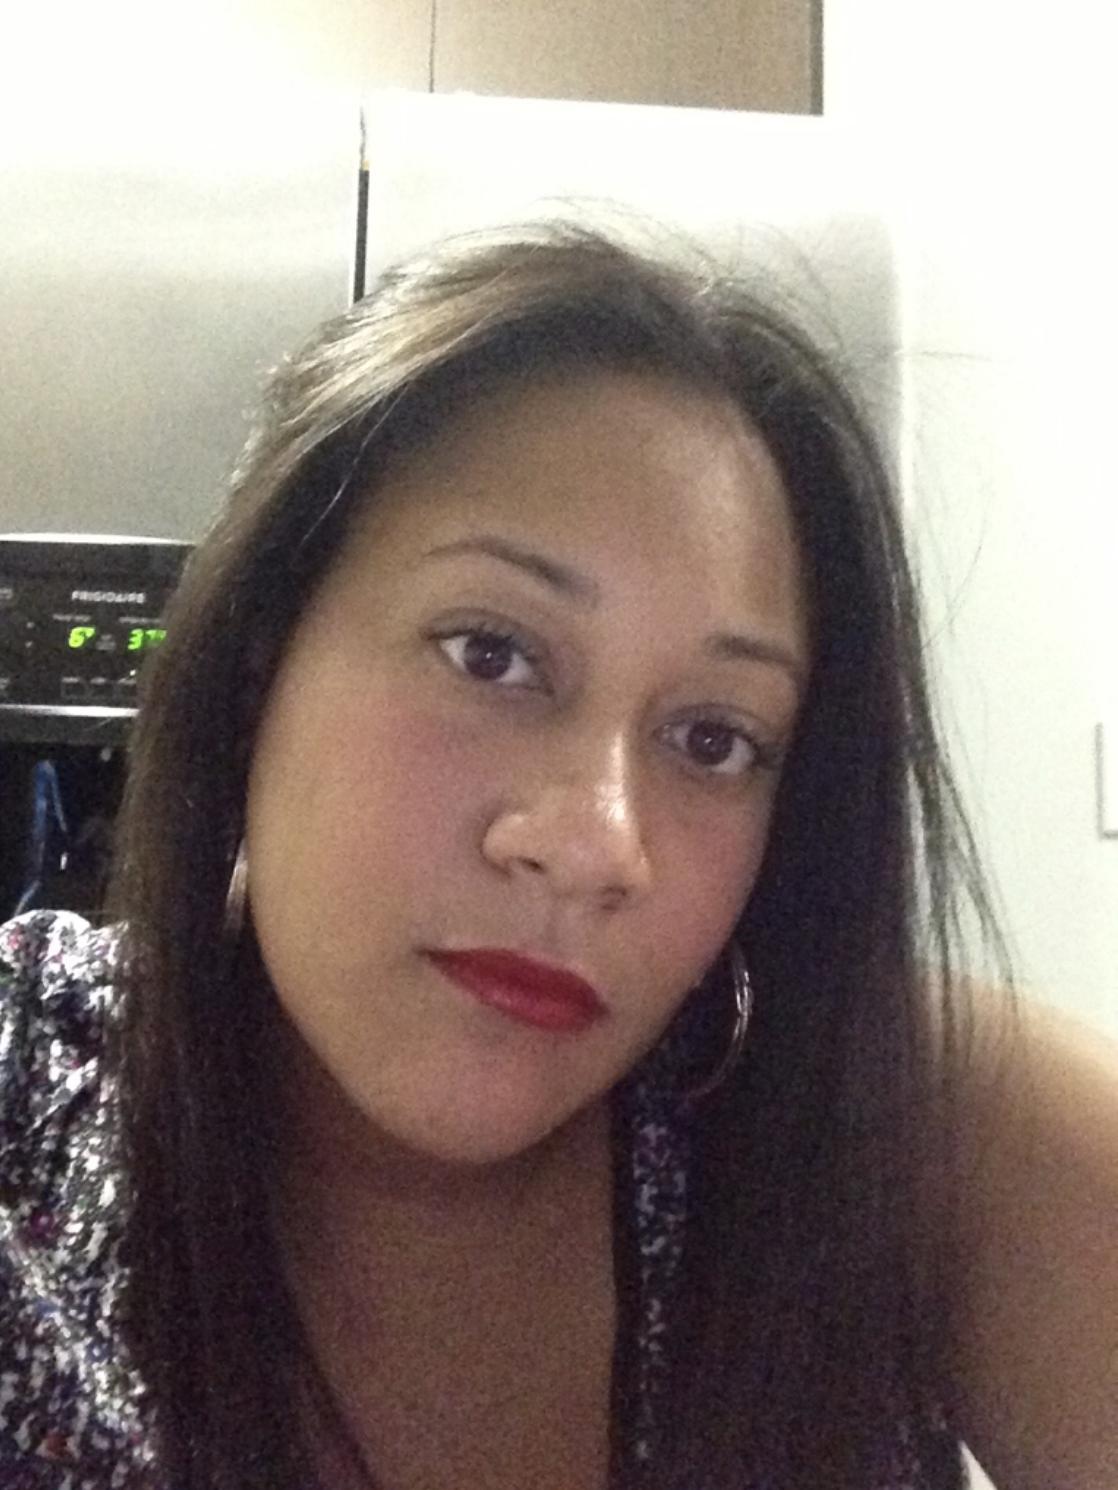 Hair 7.png